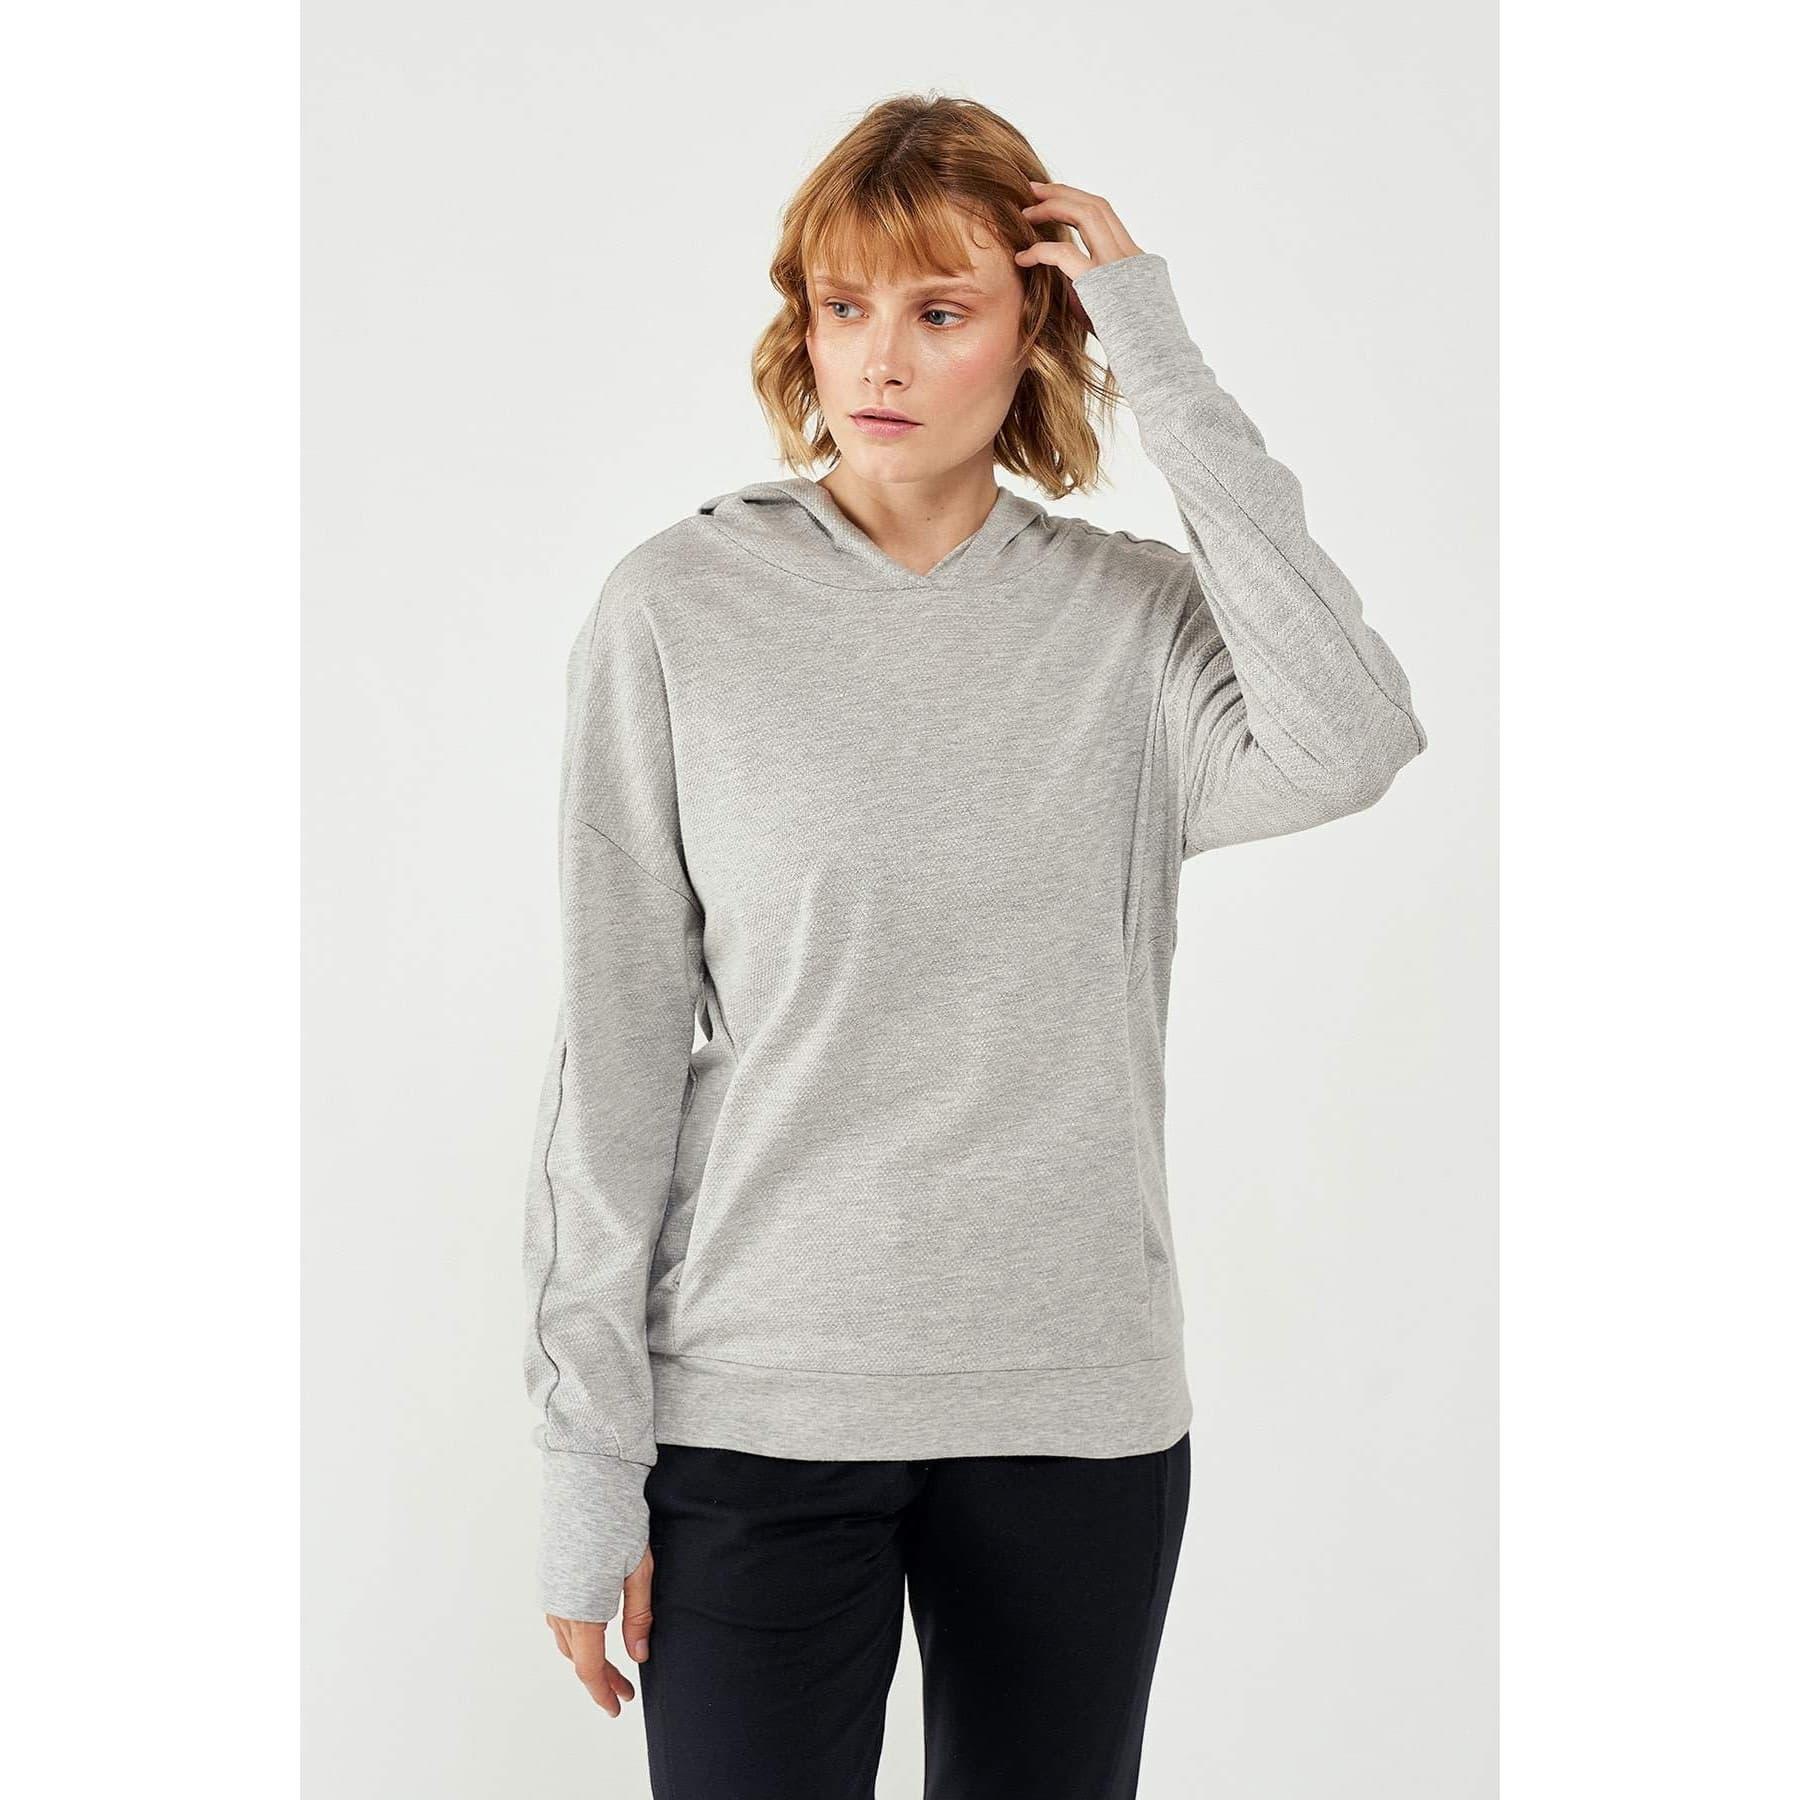 Gang Kadın Gri Sweatshirt (921084-2010)